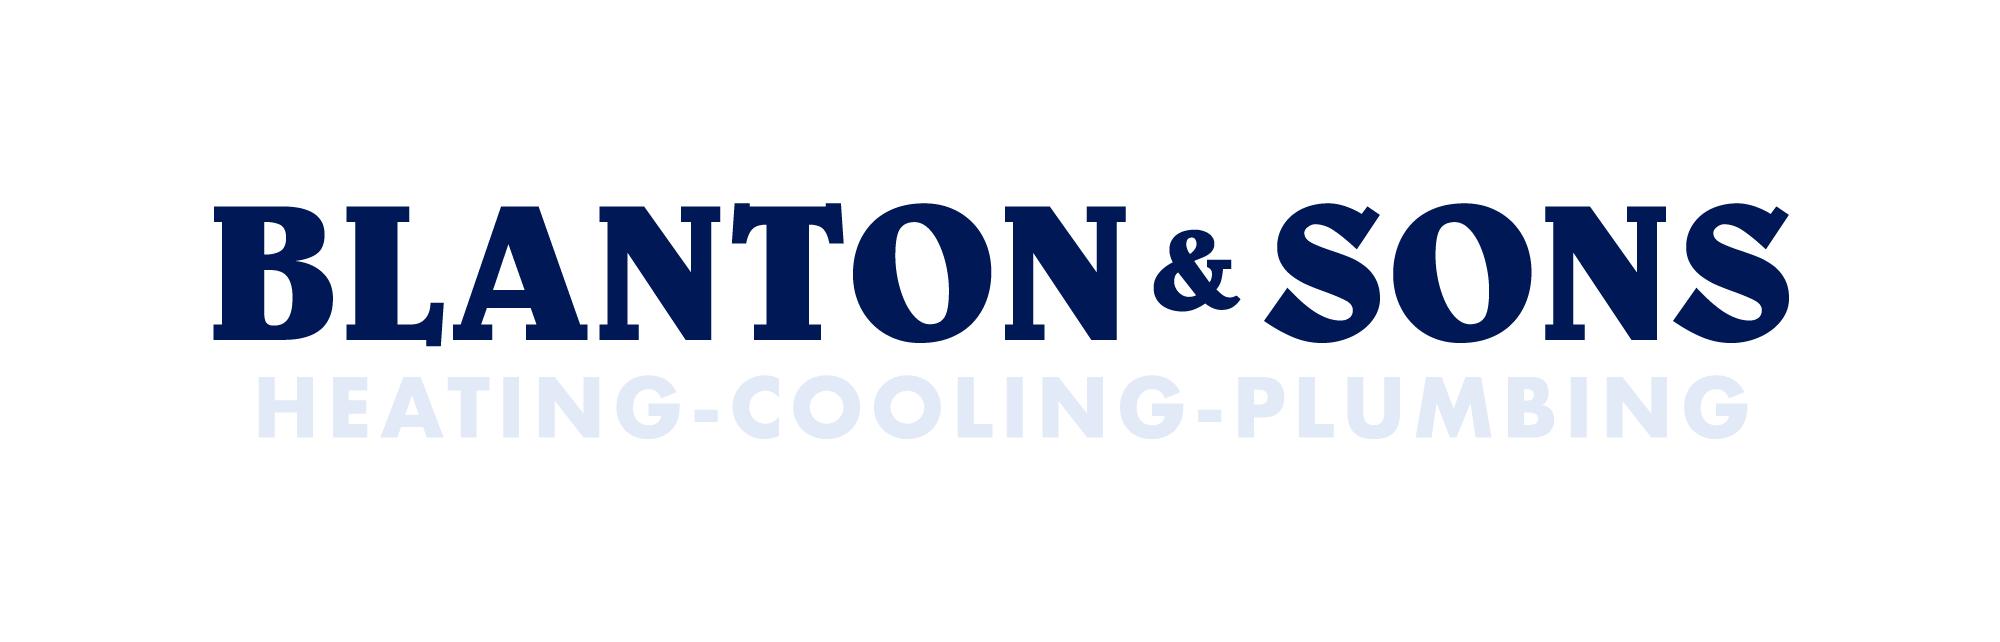 Blanton & Sons Heating Cooling Plumbing